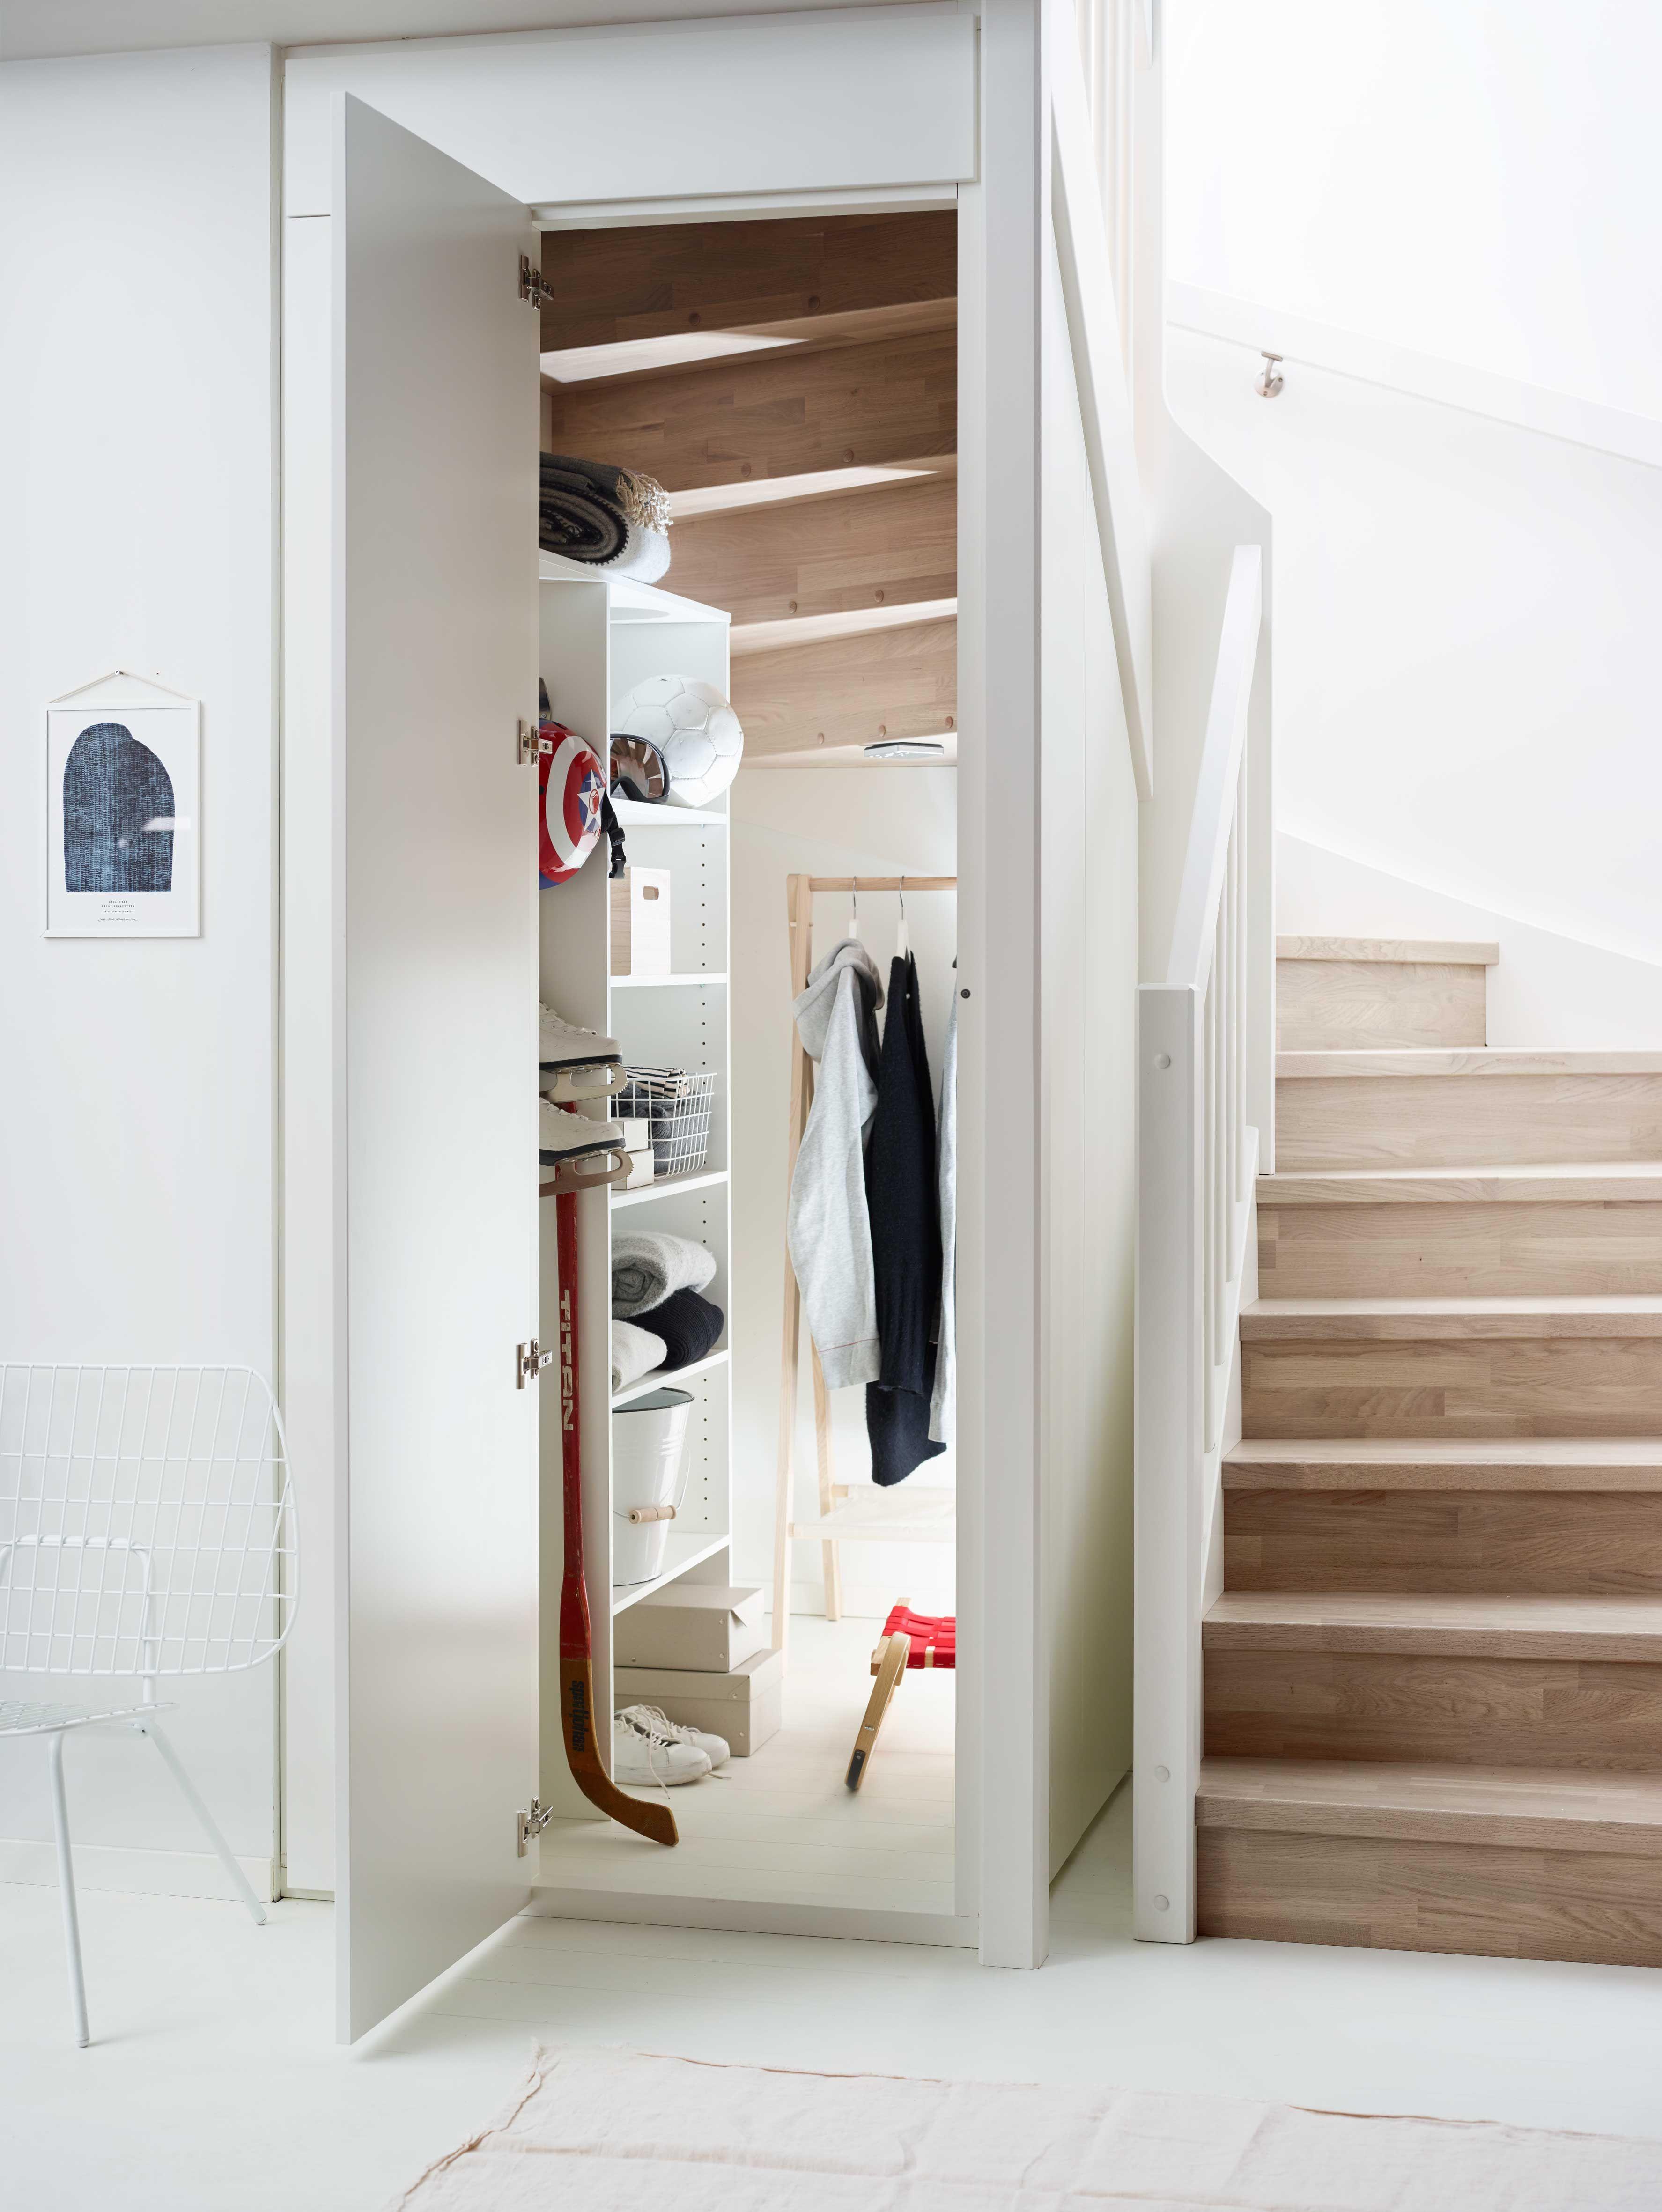 Photo of De fleste nye boliger har bare én innvendig bod. Dette kan fort by på utfordri…